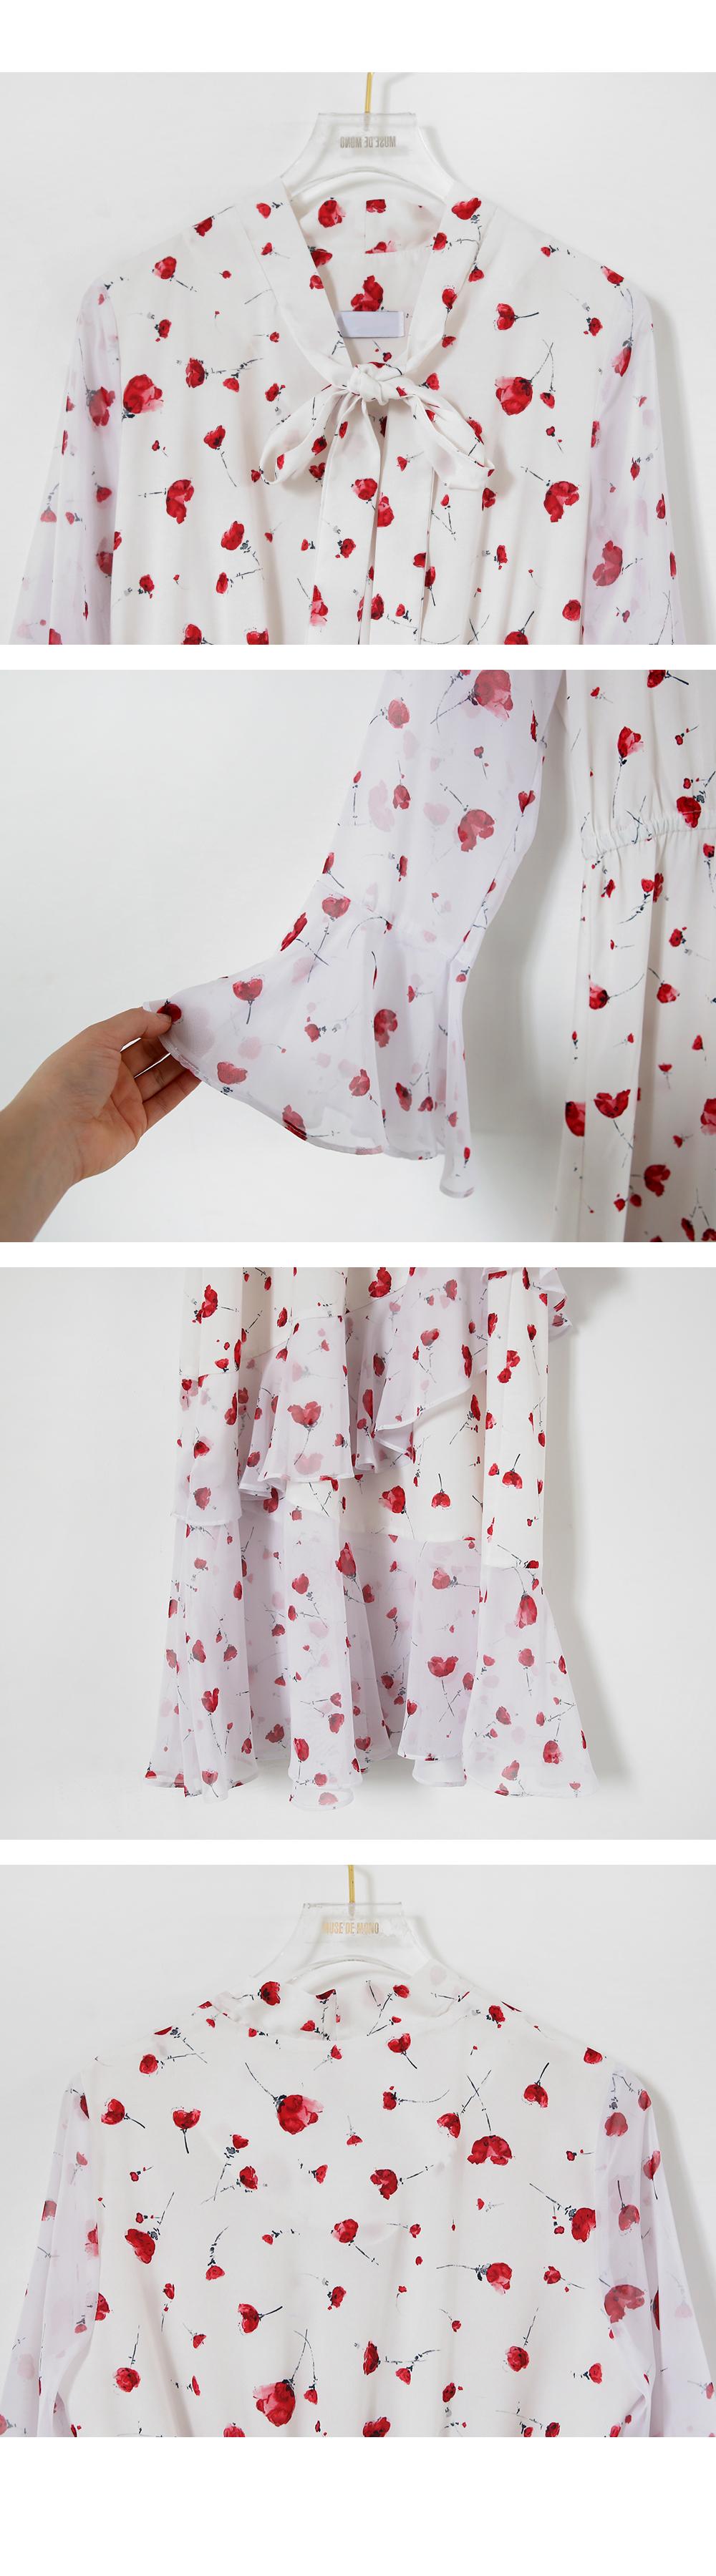 Gloves ruffle dress